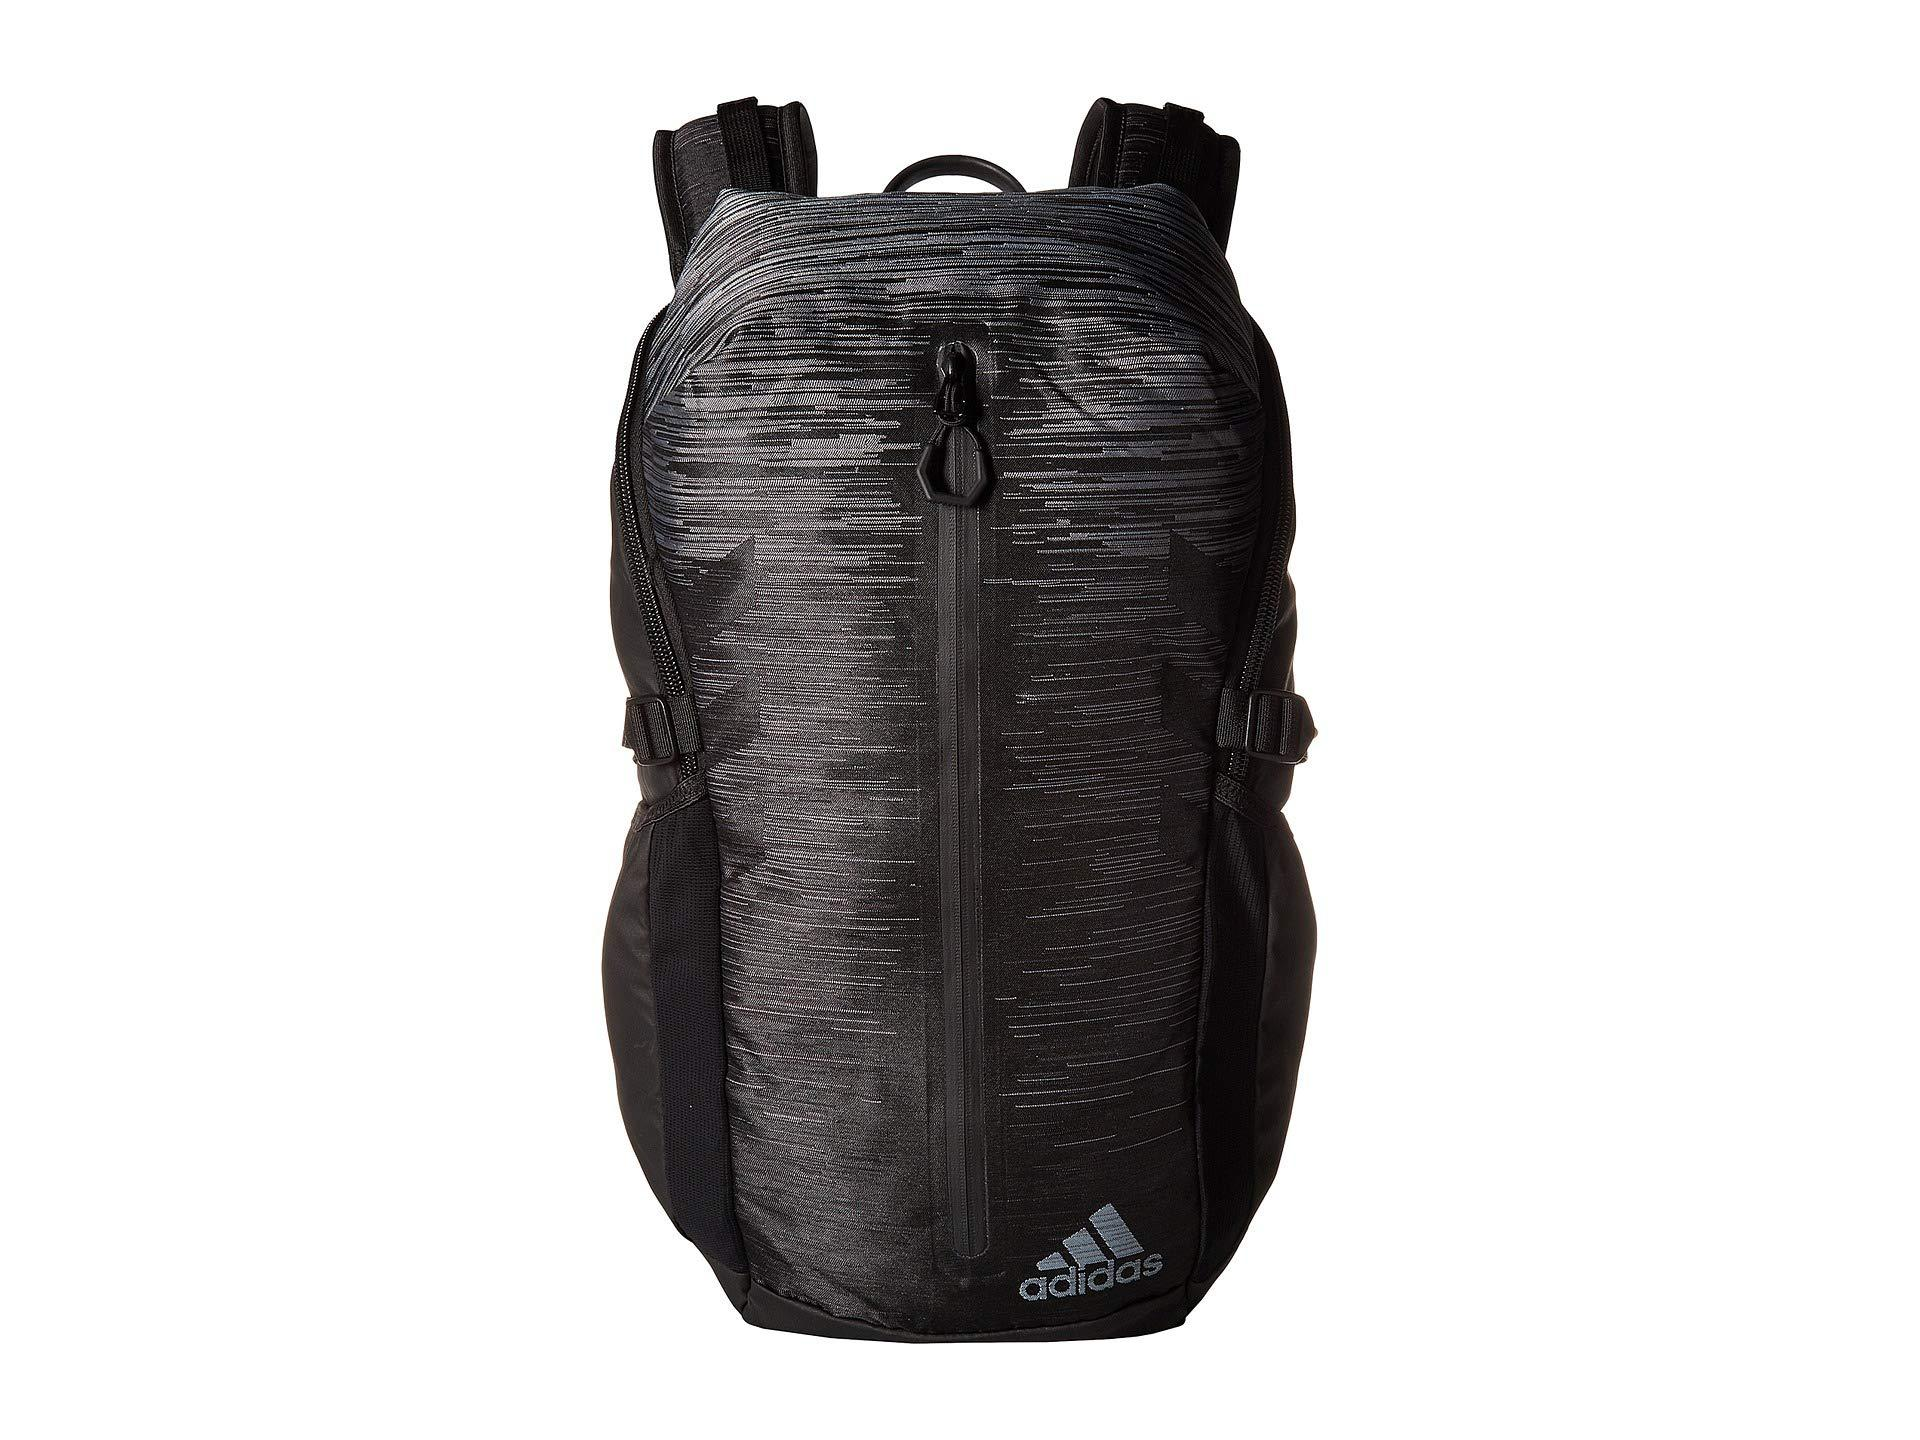 Lyst - adidas Prime Weave Backpack in Black c17fc56b0b3ca